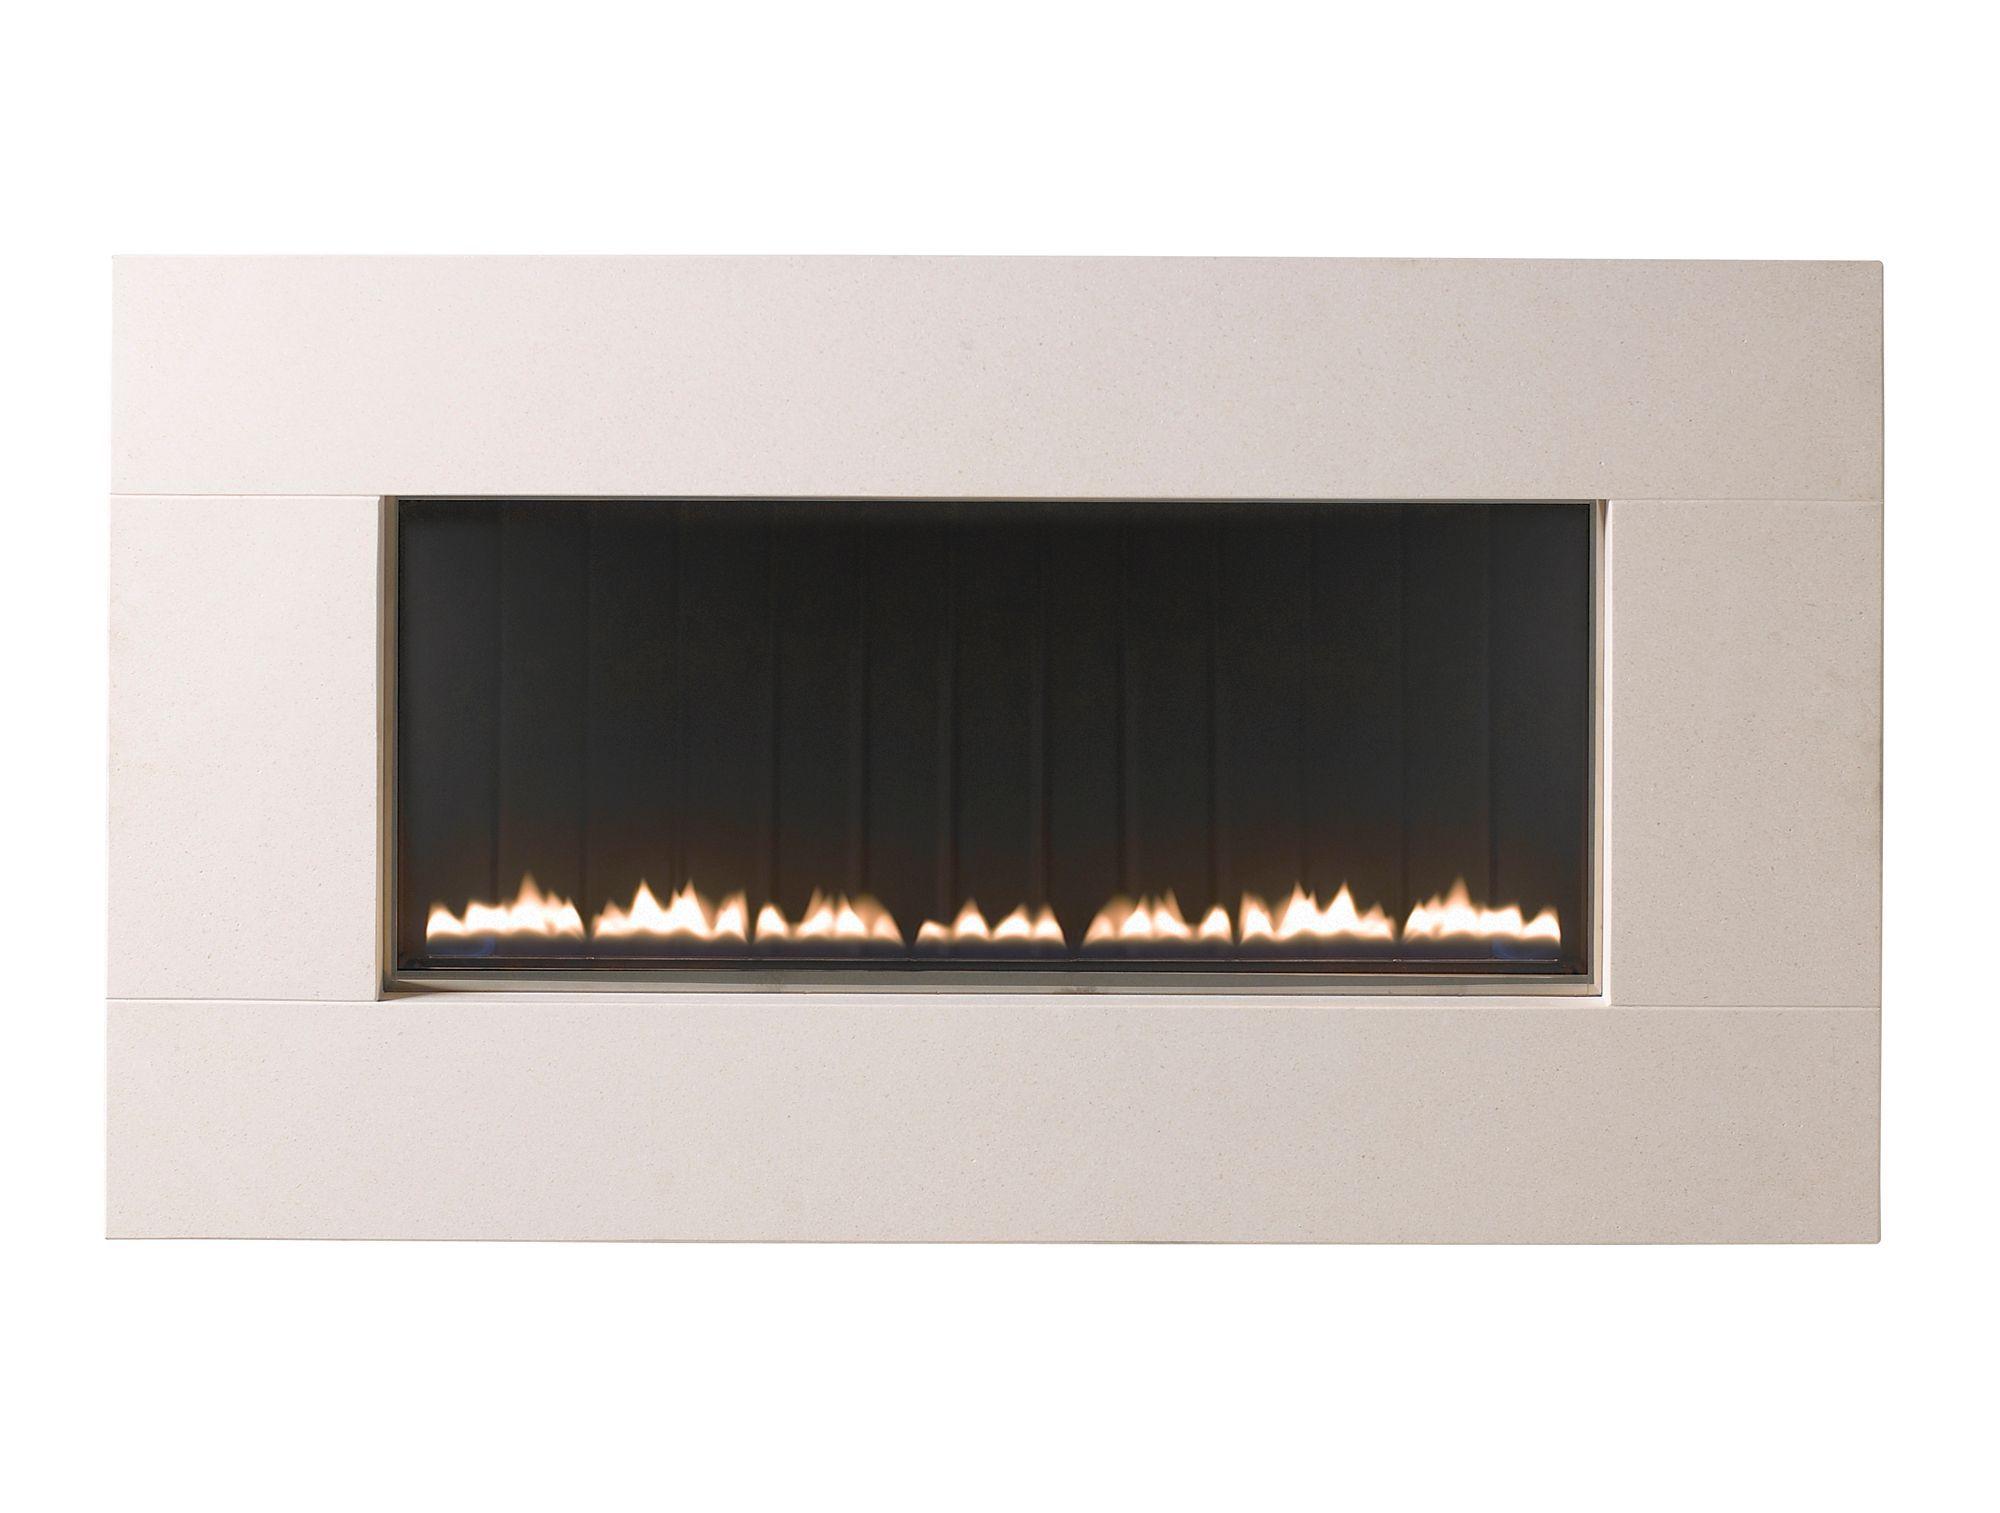 focal point memoir limestone manual control wall hung gas fire